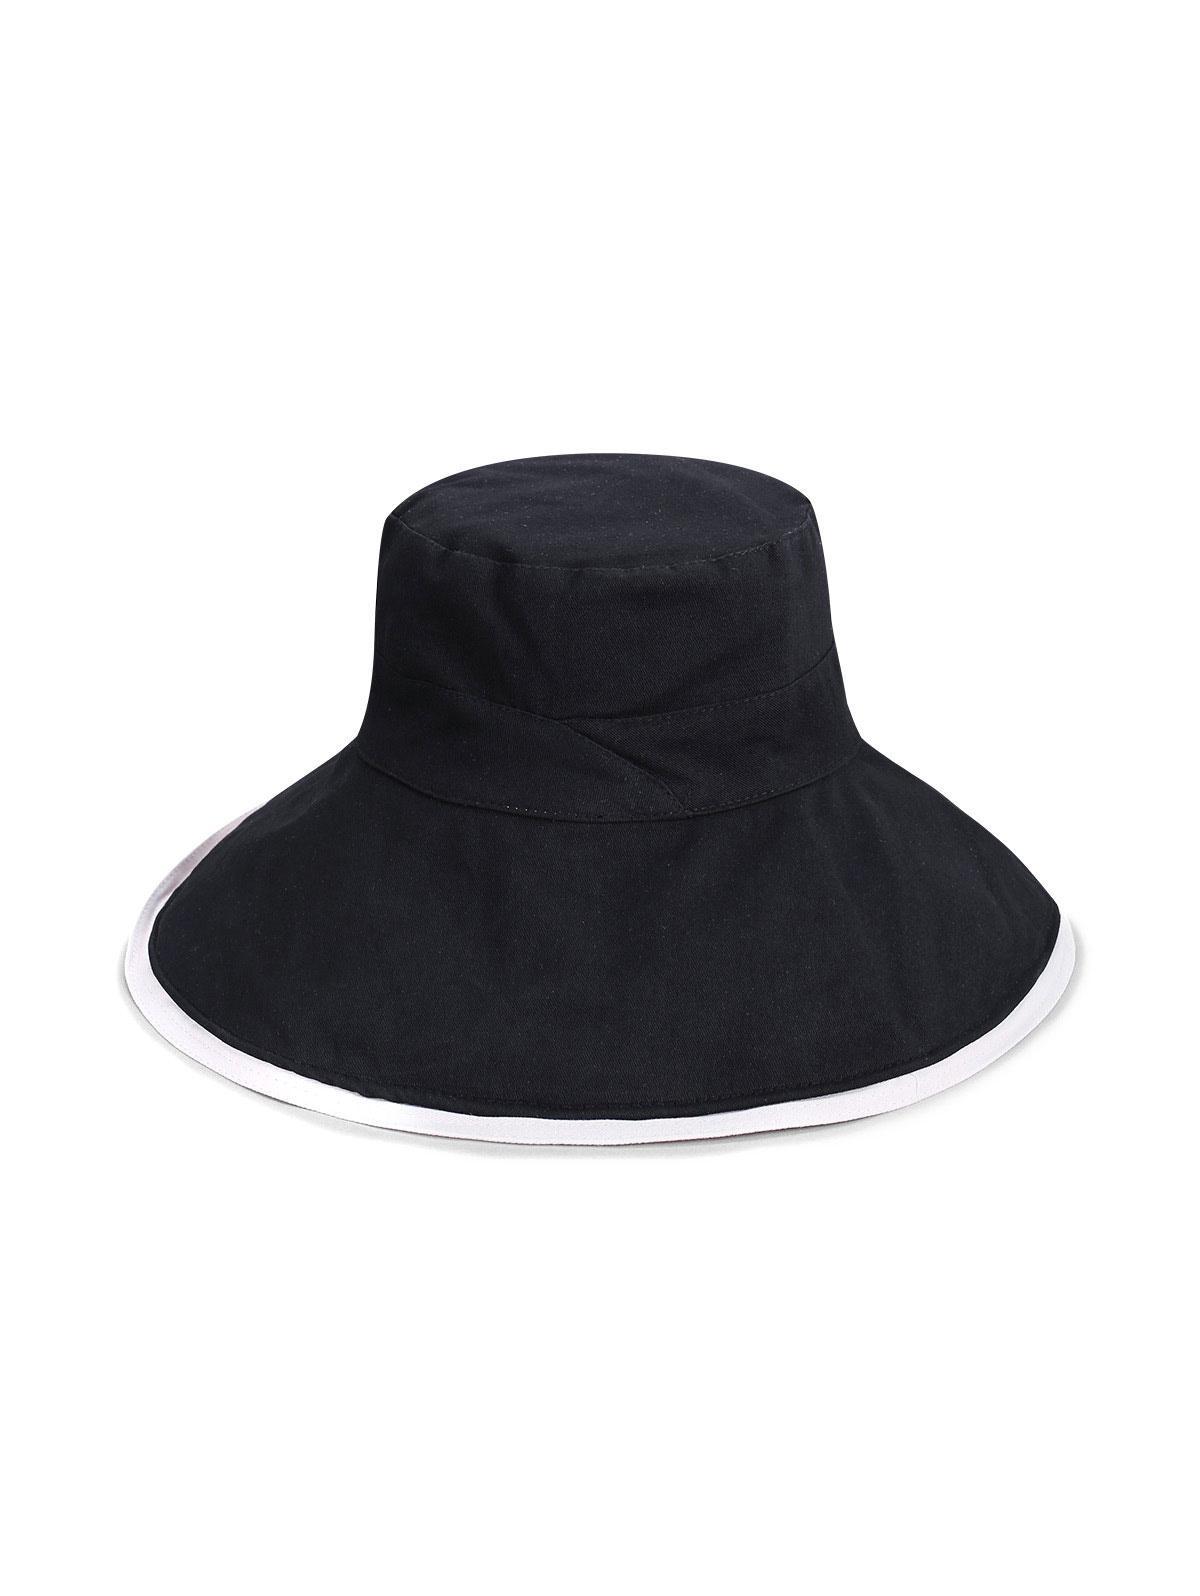 Reversible Wide Brim Bucket Hat